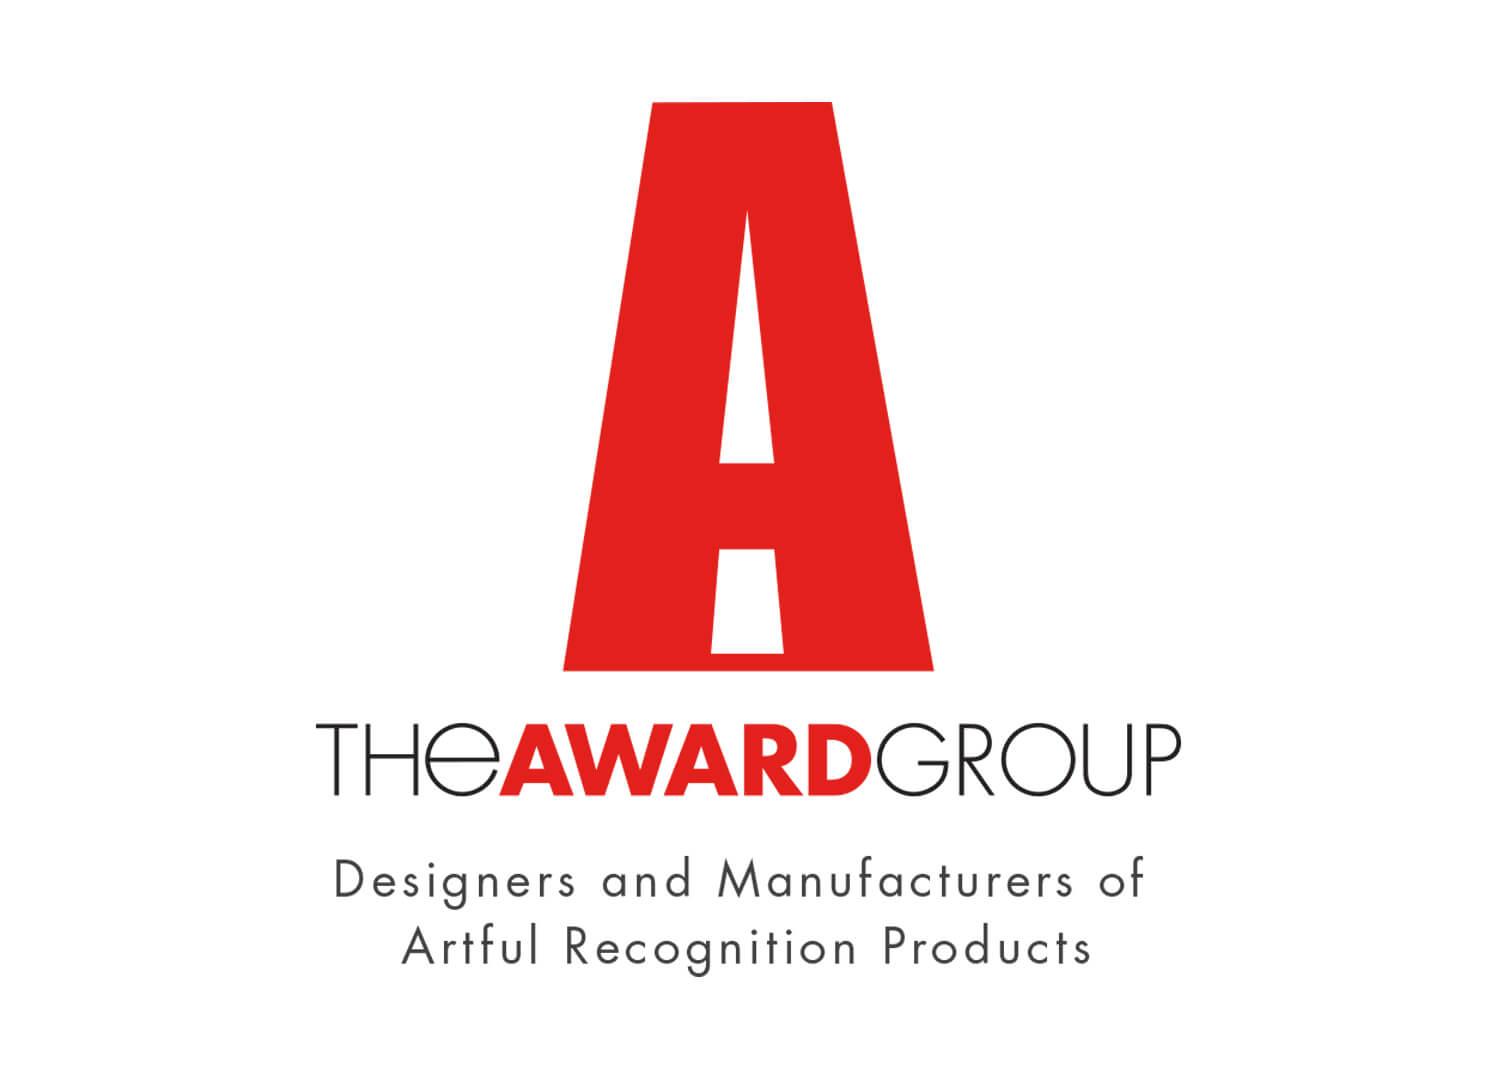 The Award group logo